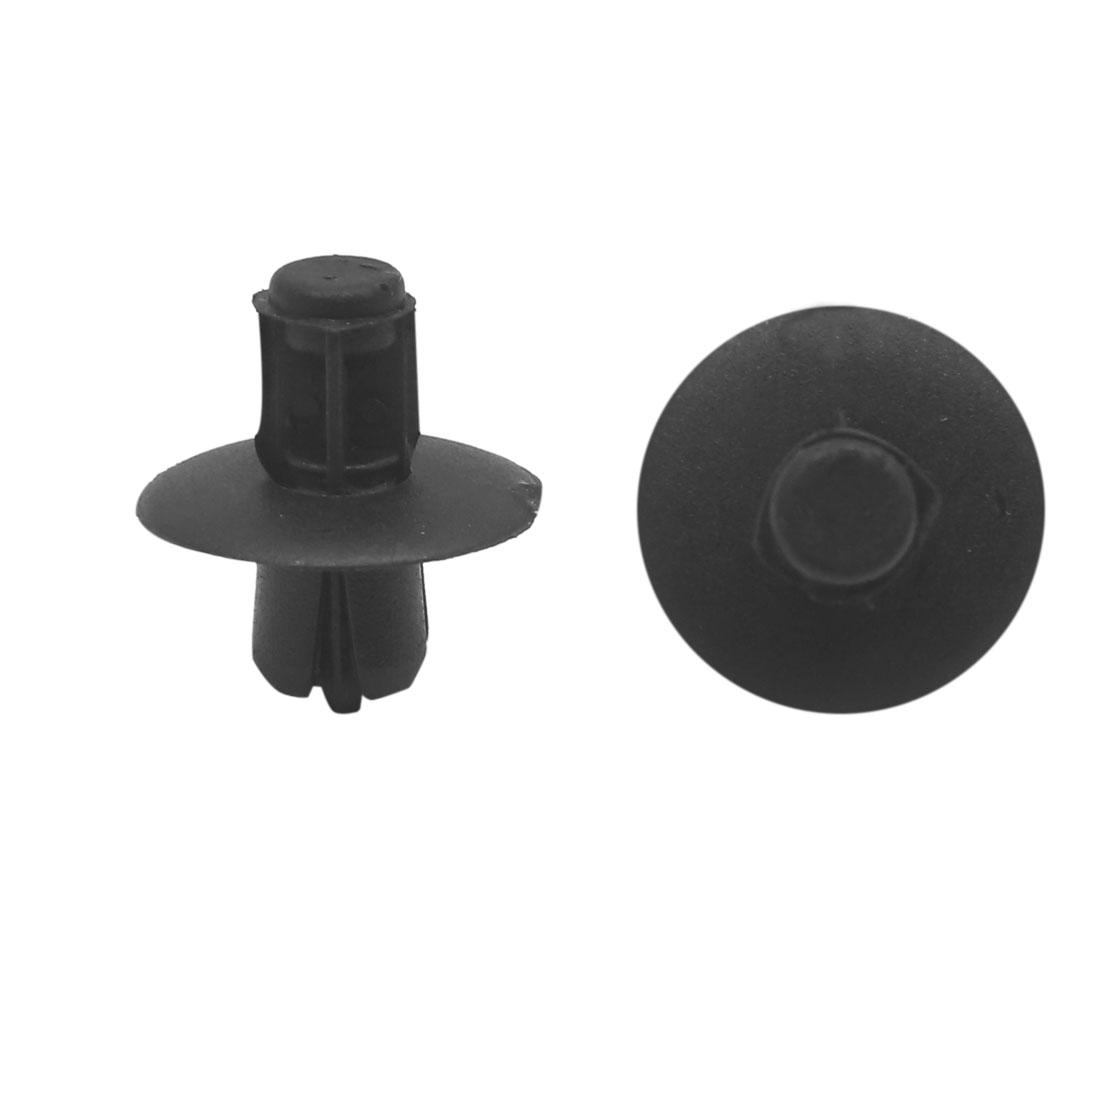 19 Pcs 8mm Hole Black Plastic Push in Rivet Car Door Panel Retainer Clips